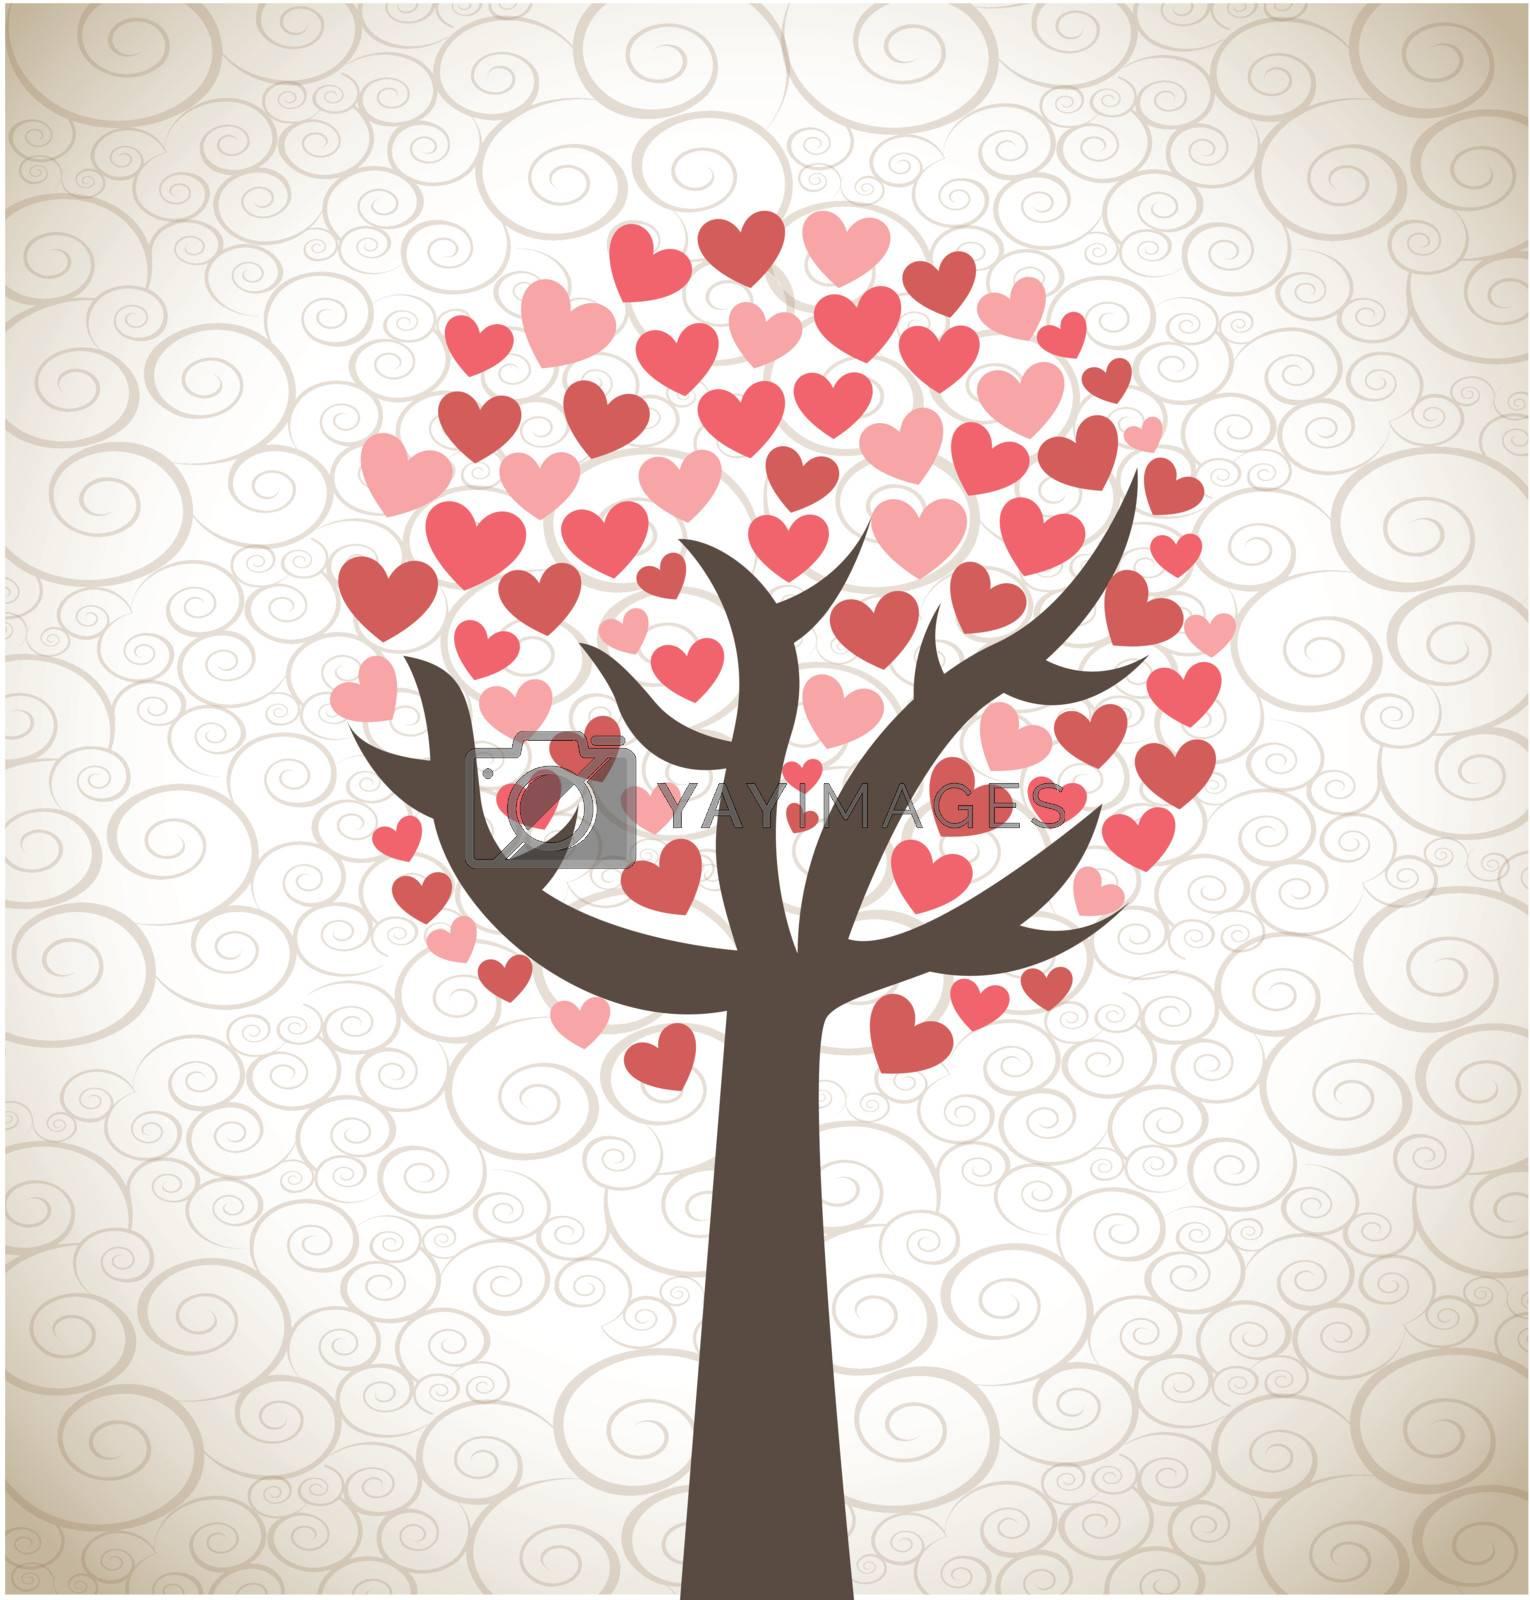 Love tree over background  vector illustration